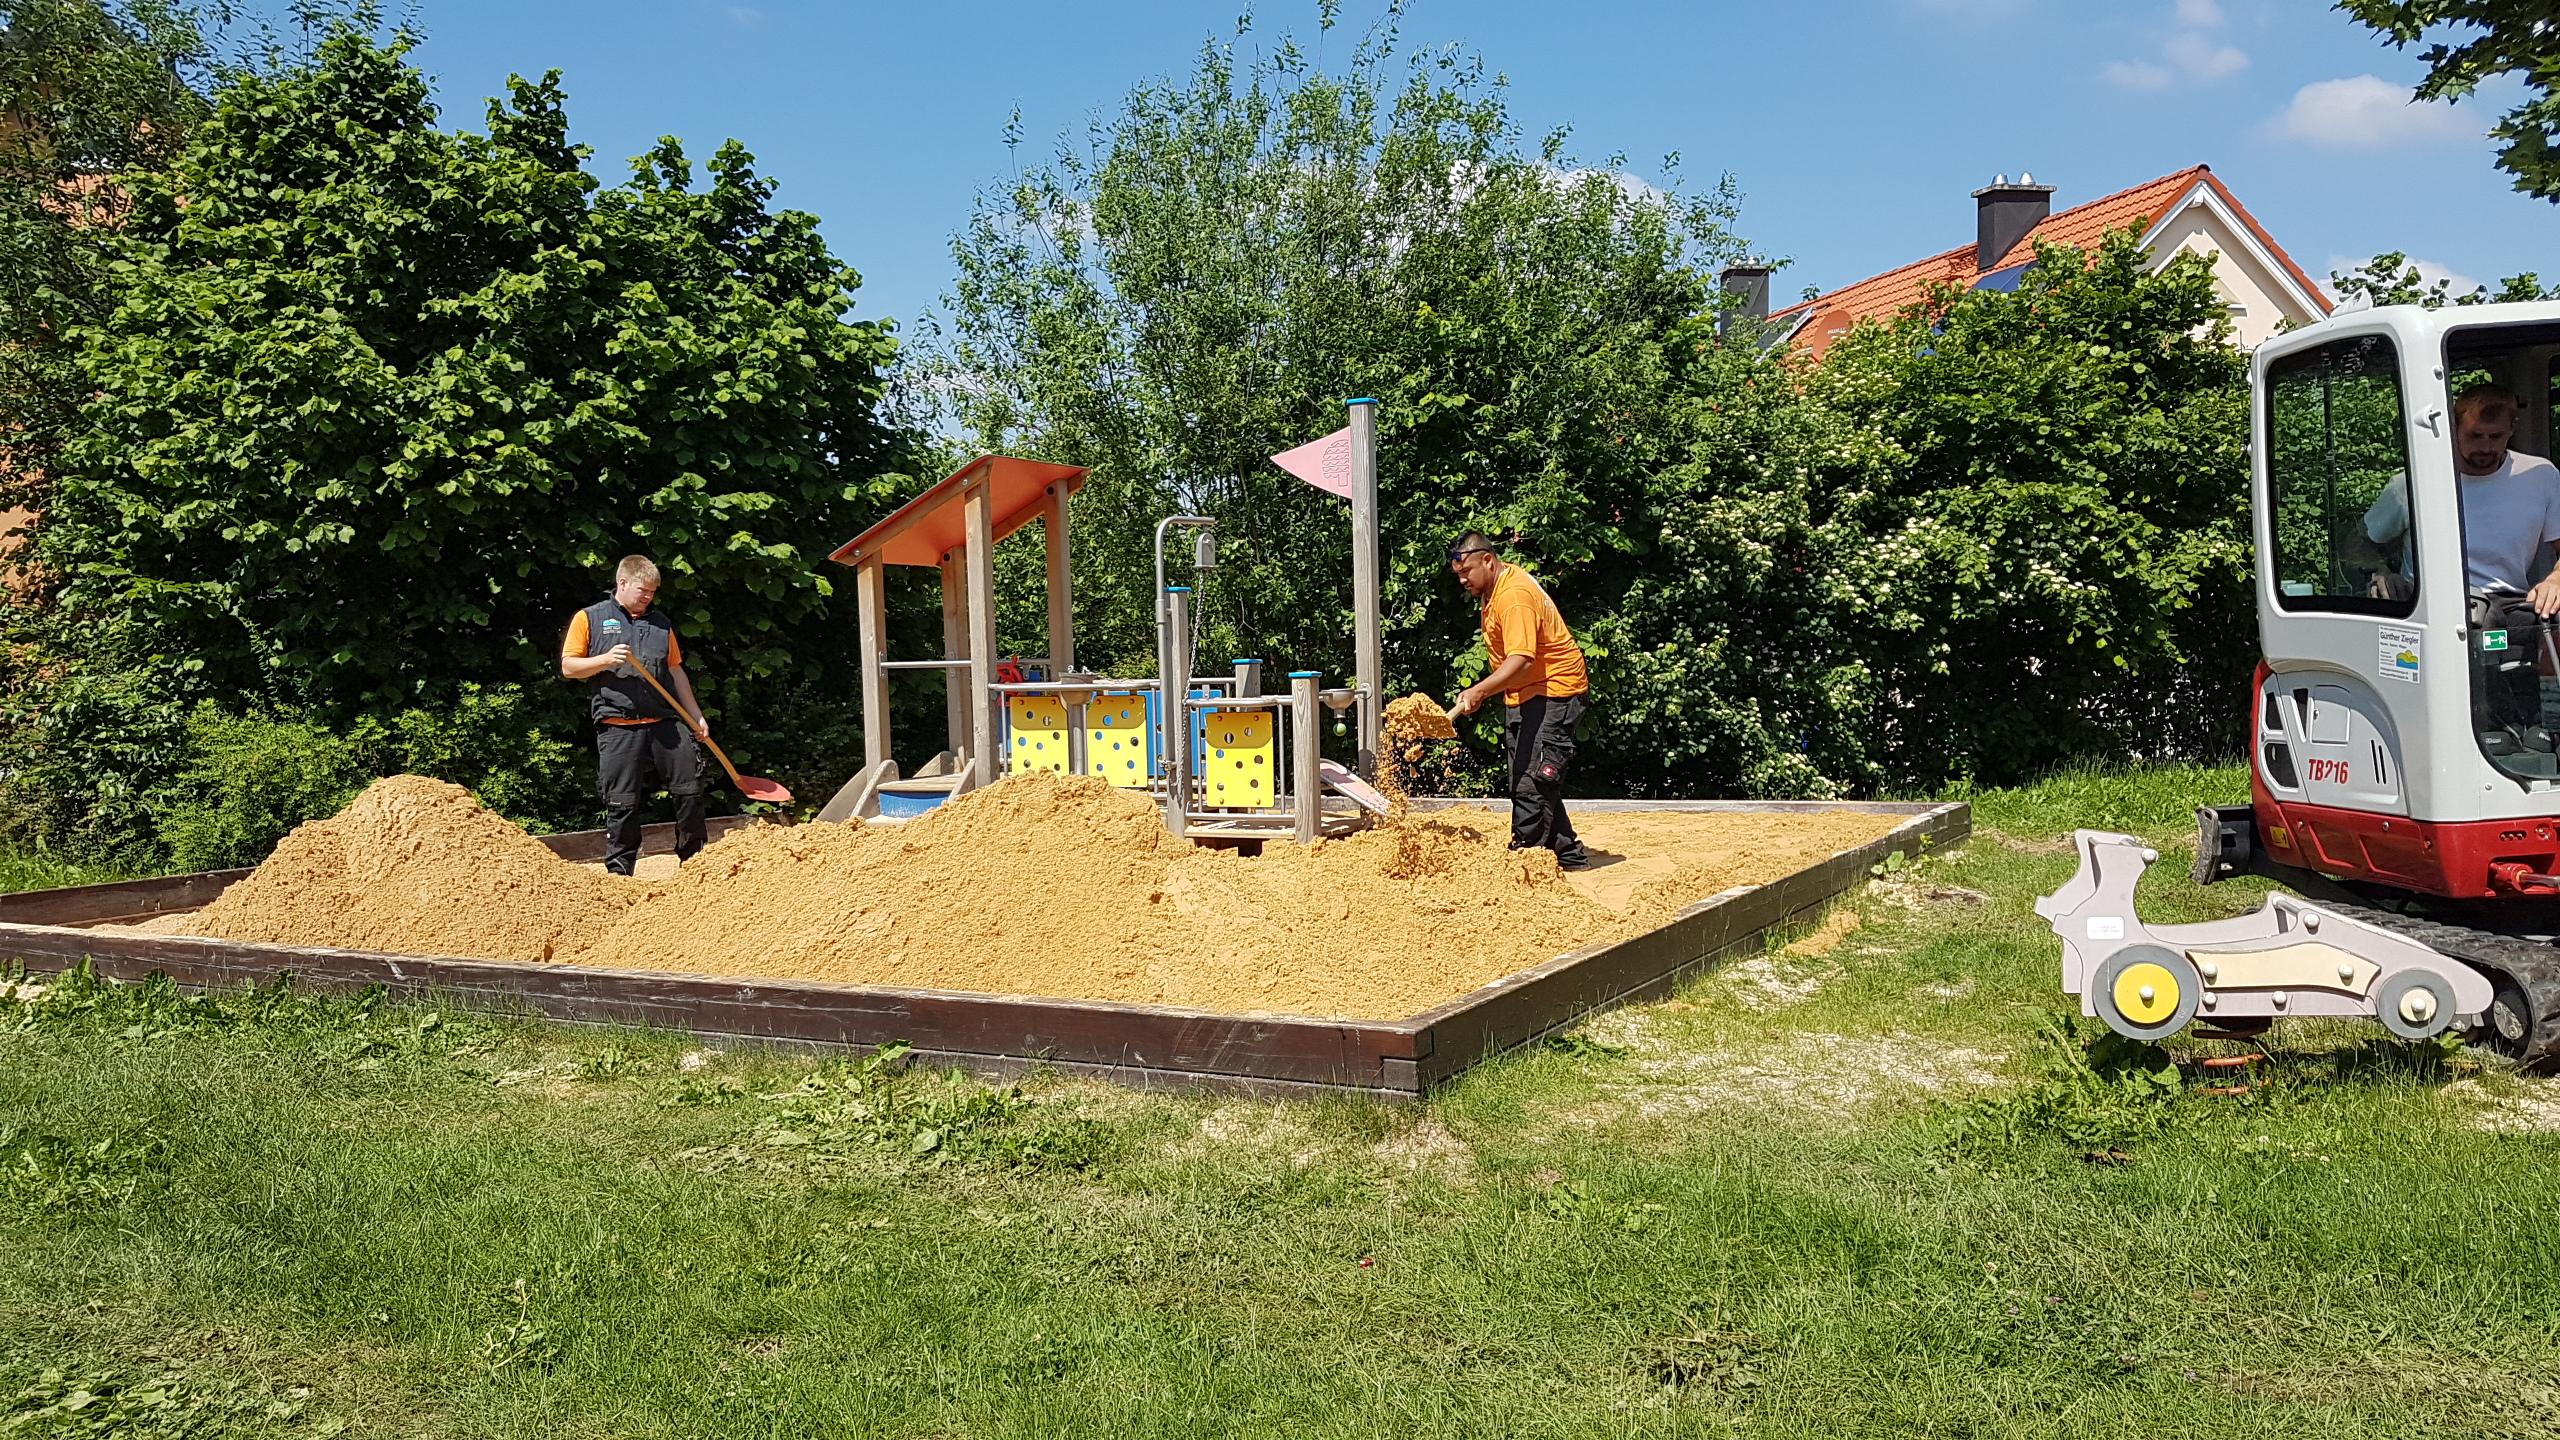 Sandarbeiten